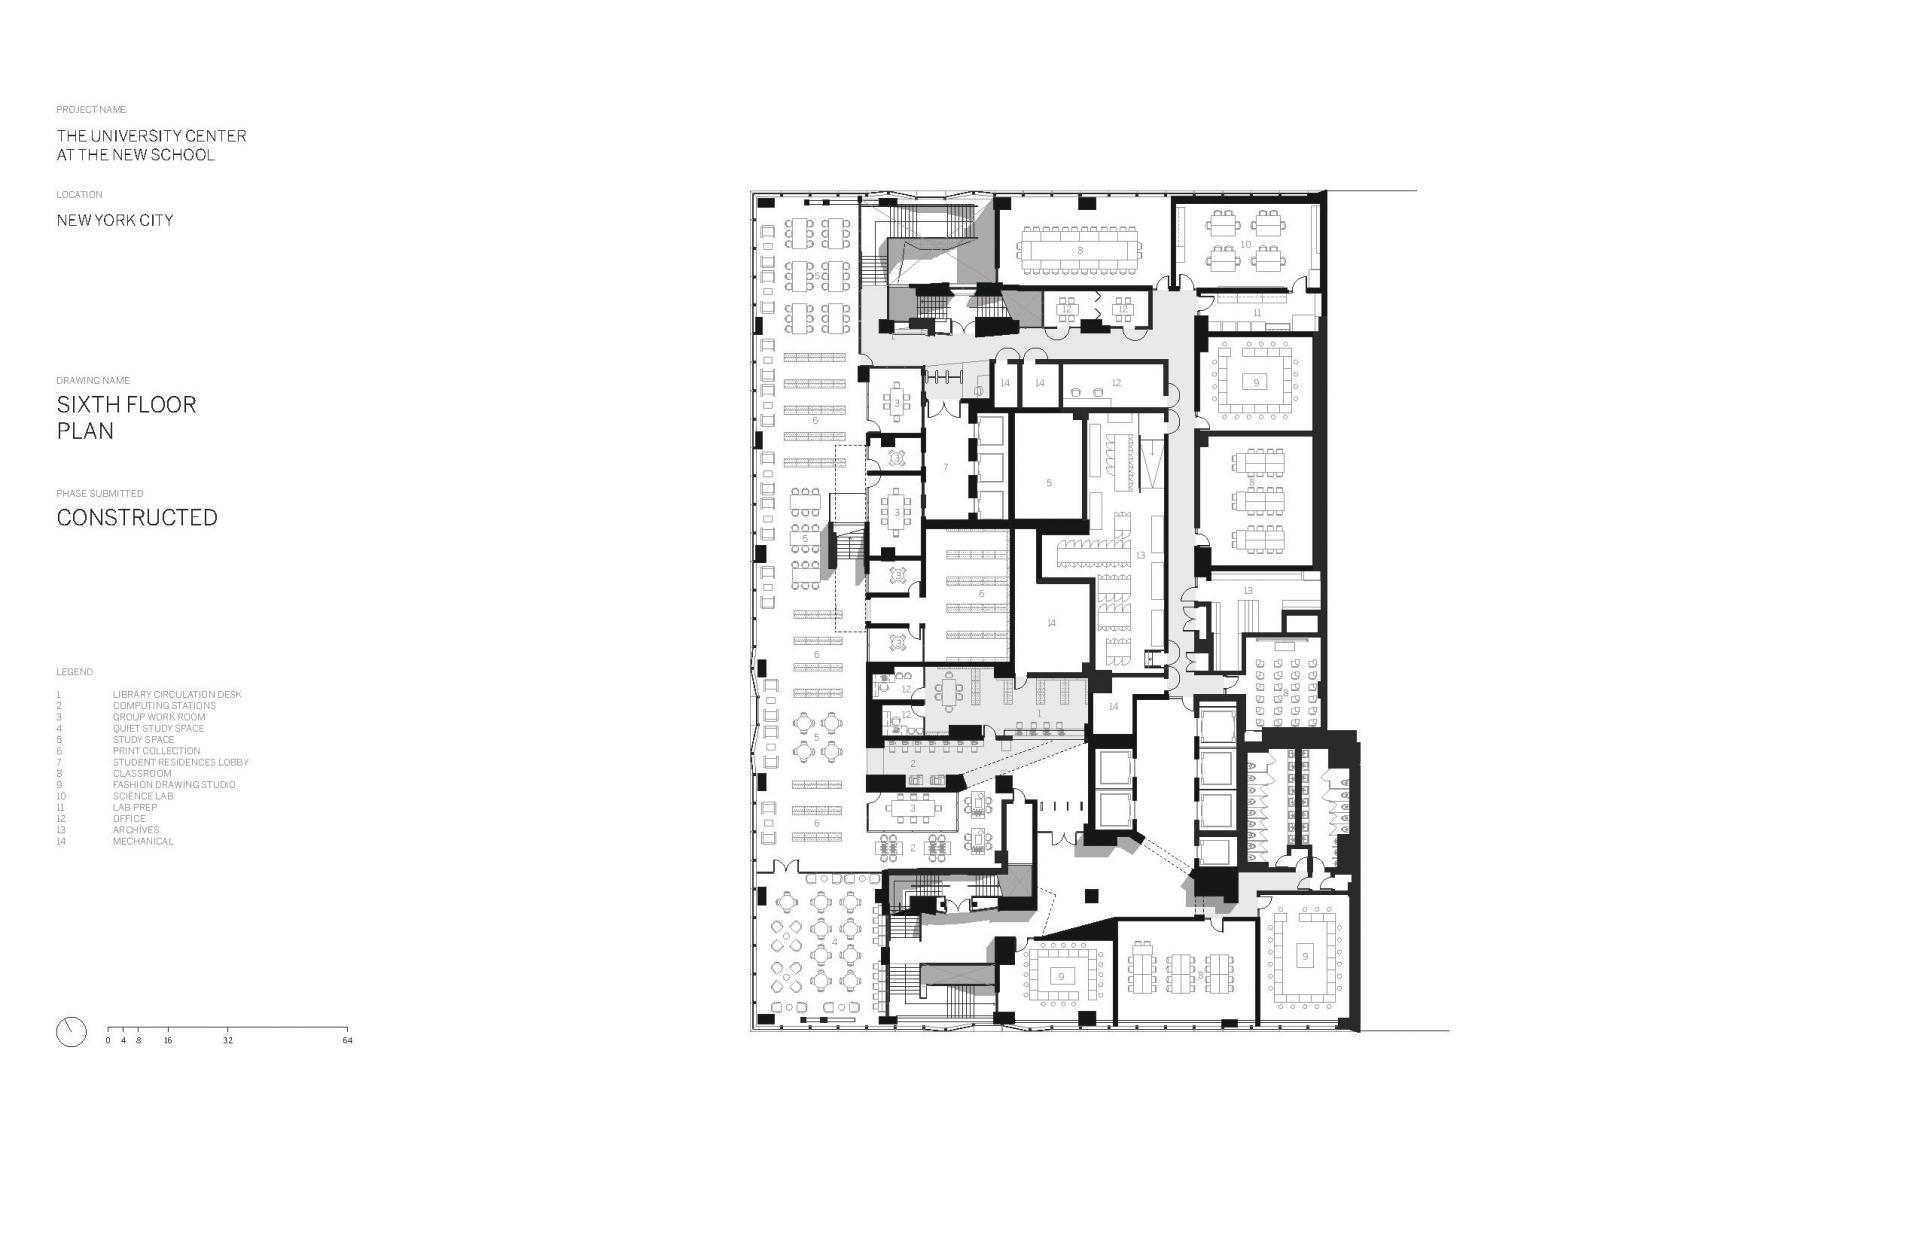 Схема учебного центра Greenwich Village в Нью Йорке - Фото 7